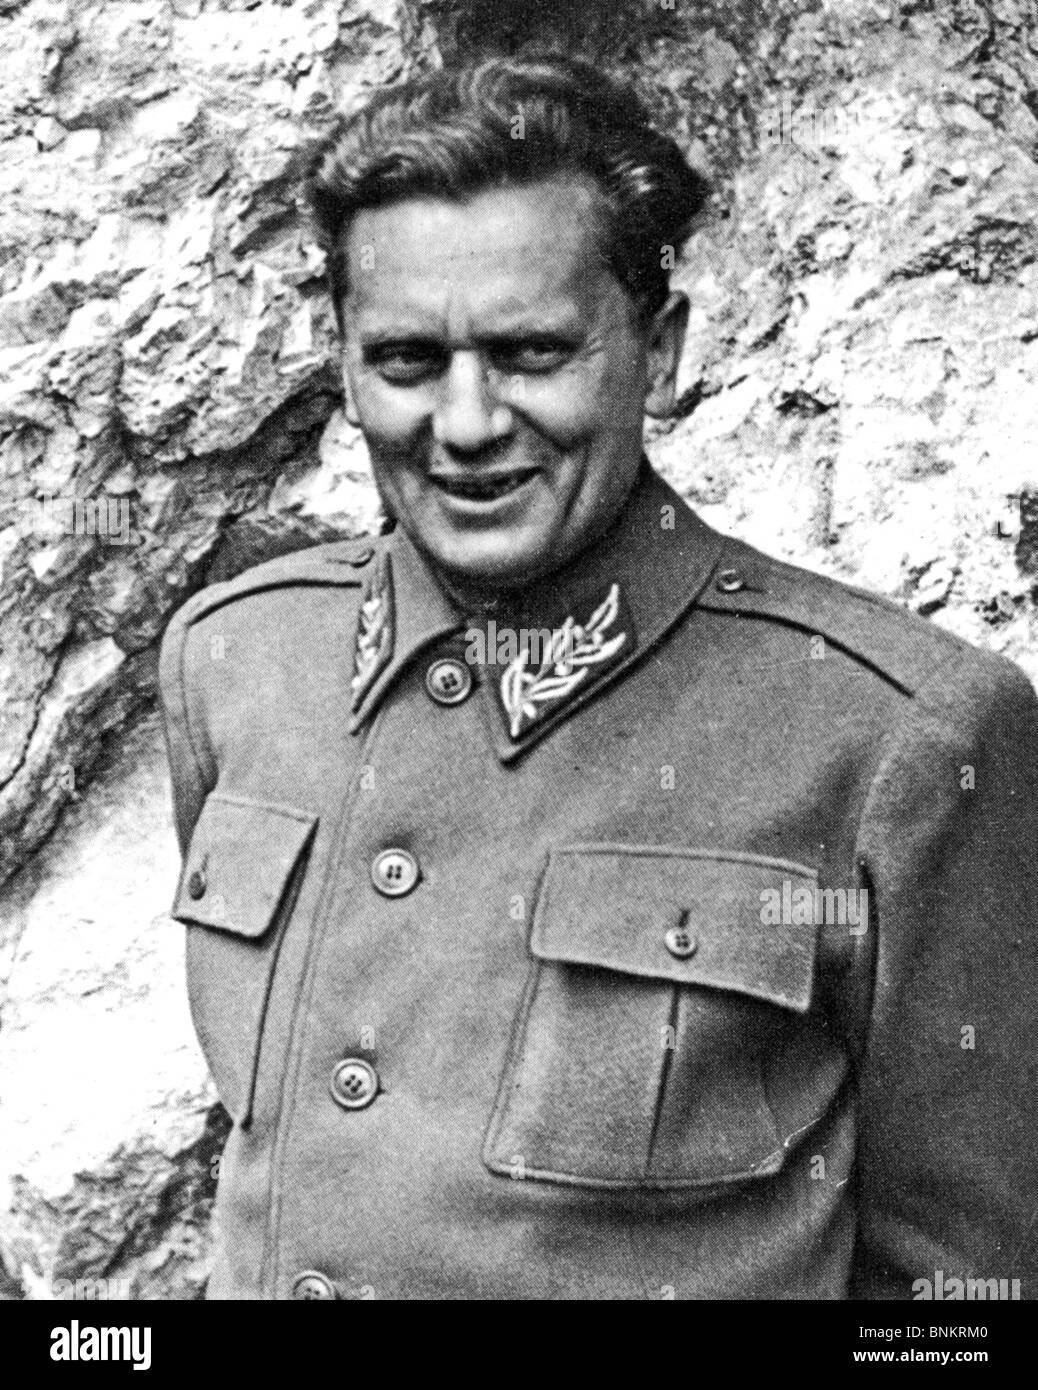 JOSIP BROZ TITO (1892-1980) Yugoslav revolutionary and statesman here about 1944